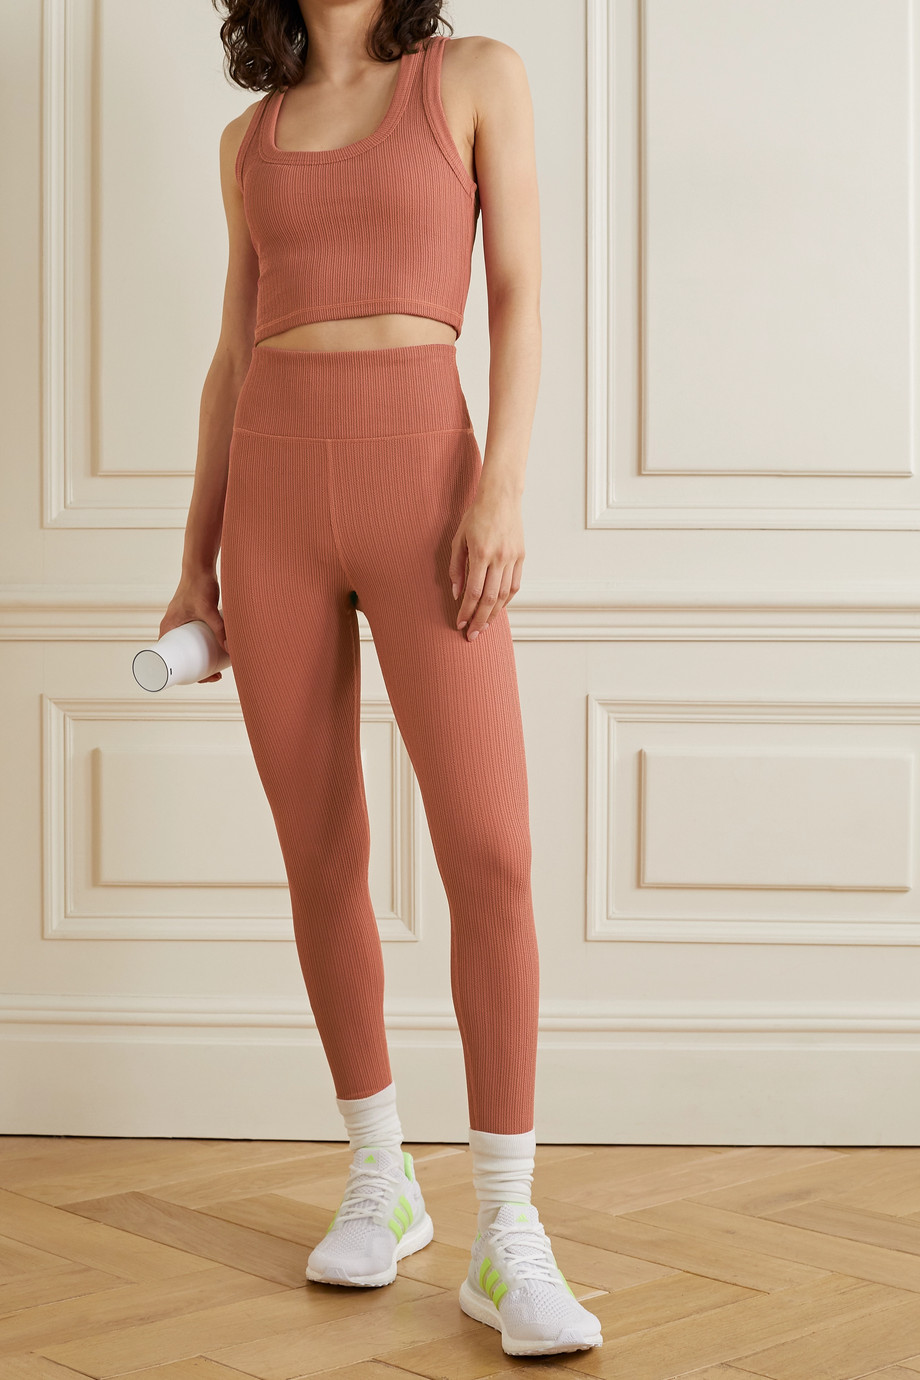 The Upside Leandra stretch-jacquard sports bra